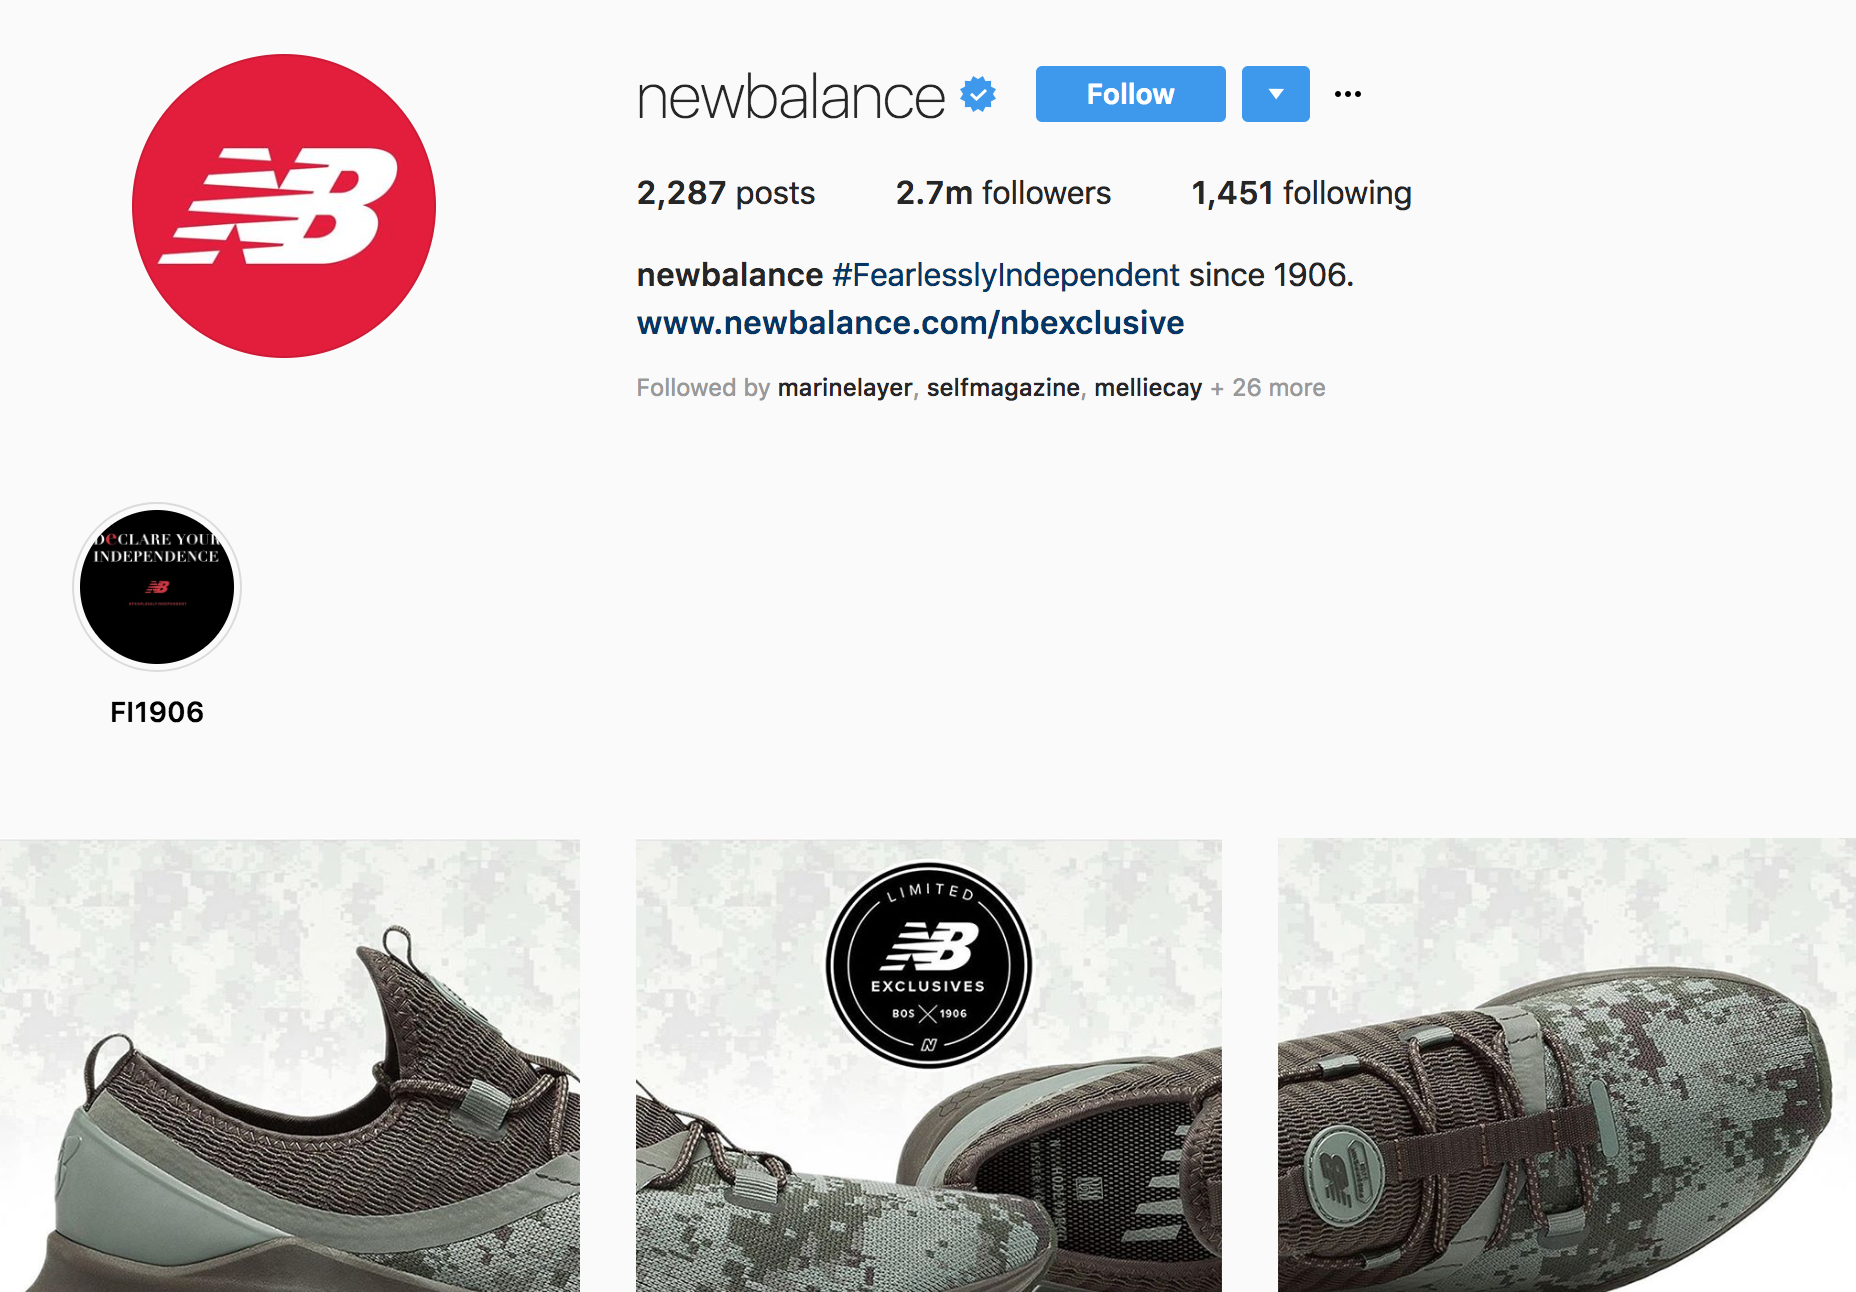 New Balance Instagram